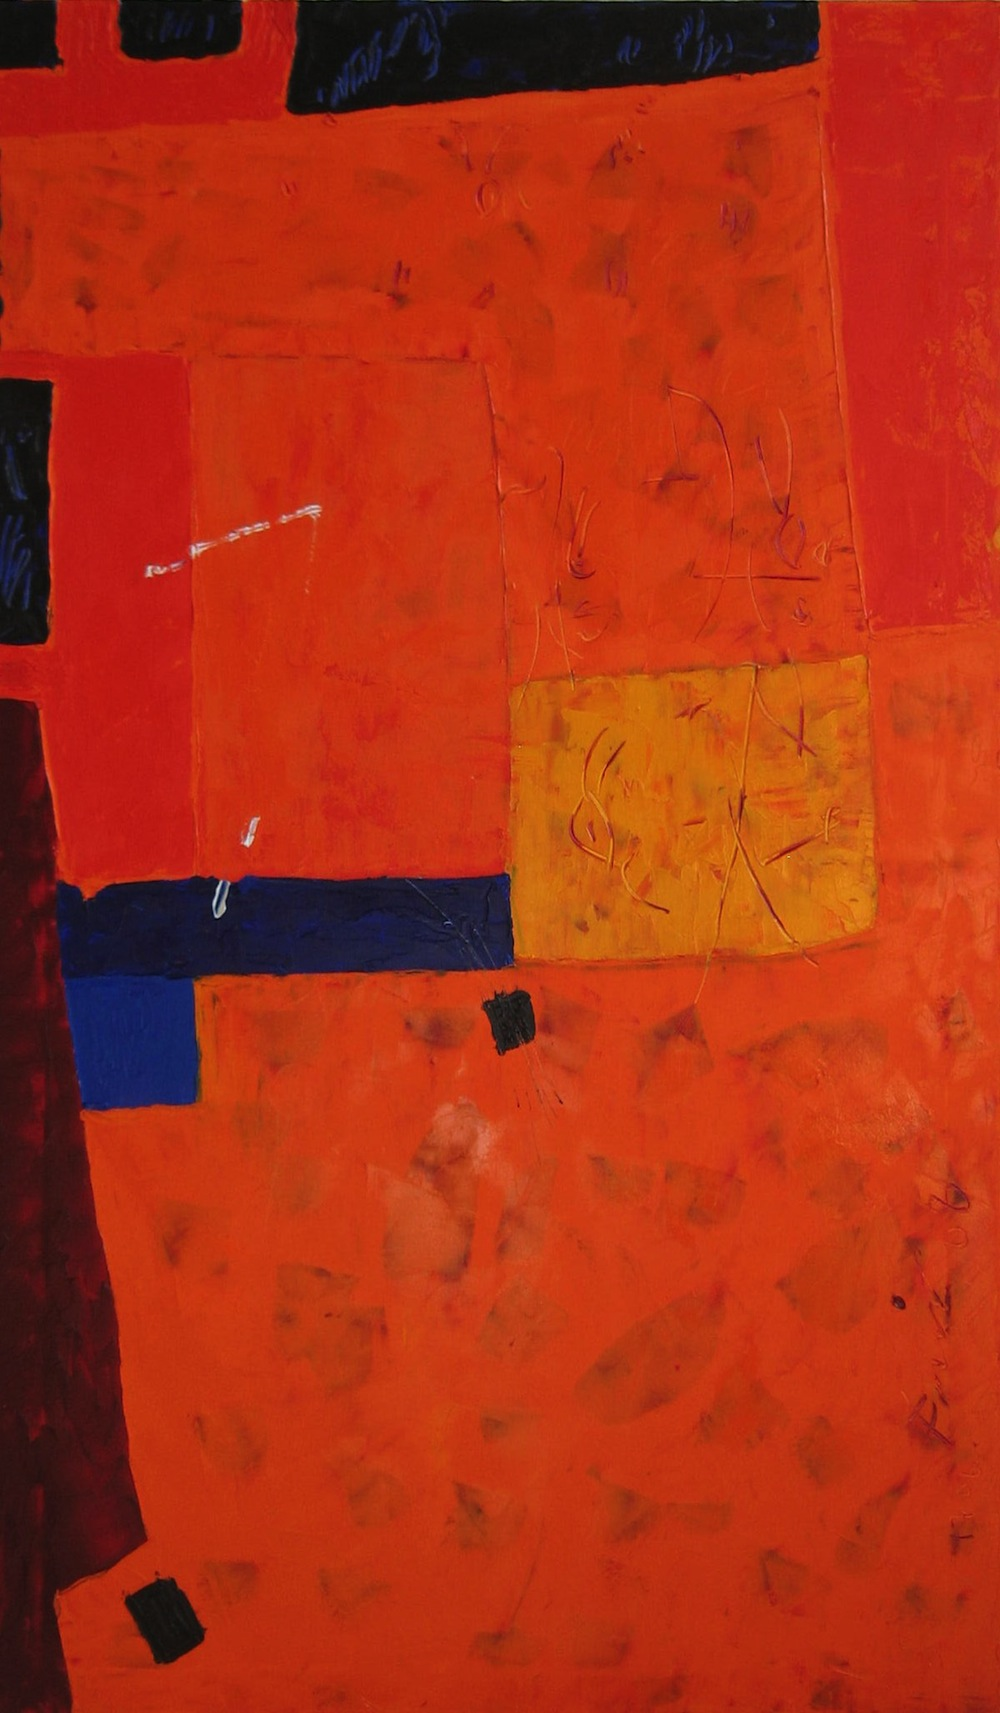 Arancio, 2009<br/>Olio su tela, 80 x 100 cm